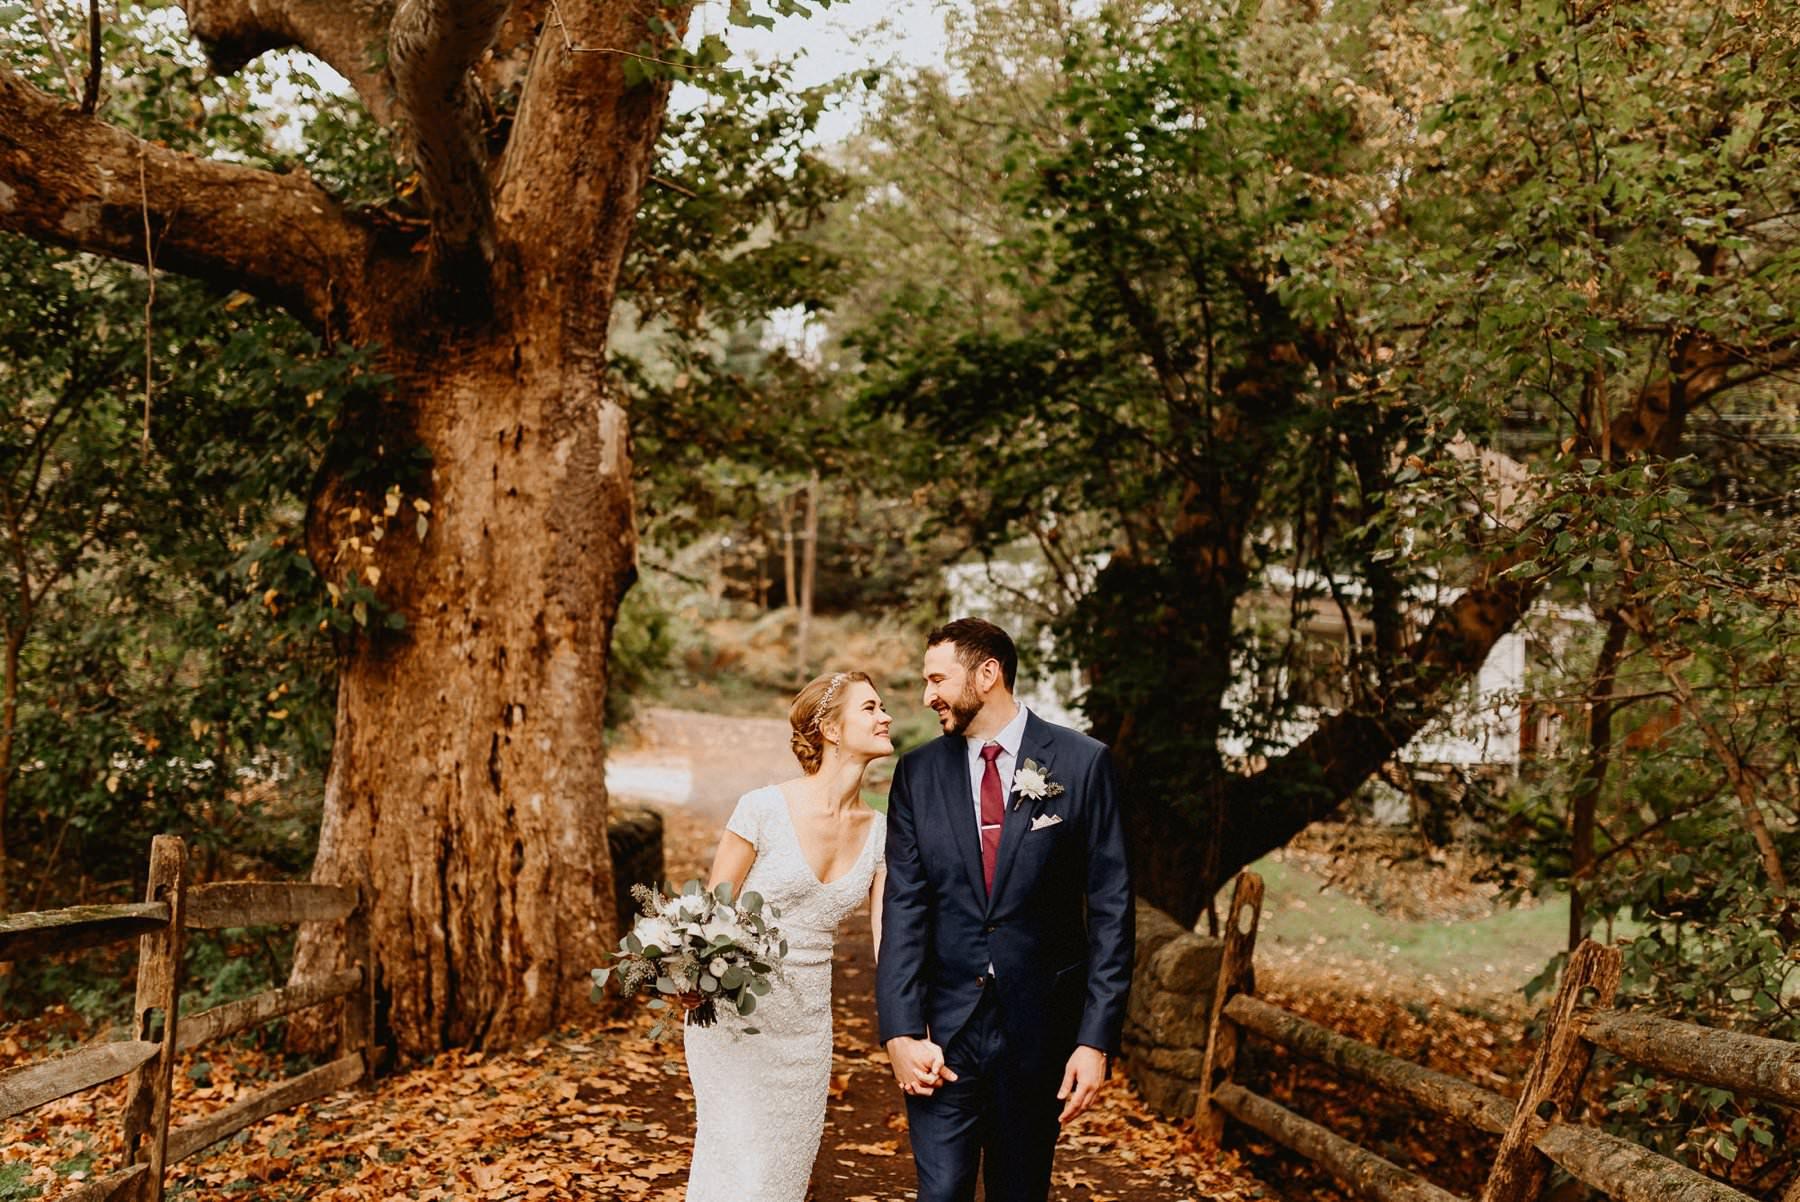 John_James_Audubon_Center_wedding-26.jpg